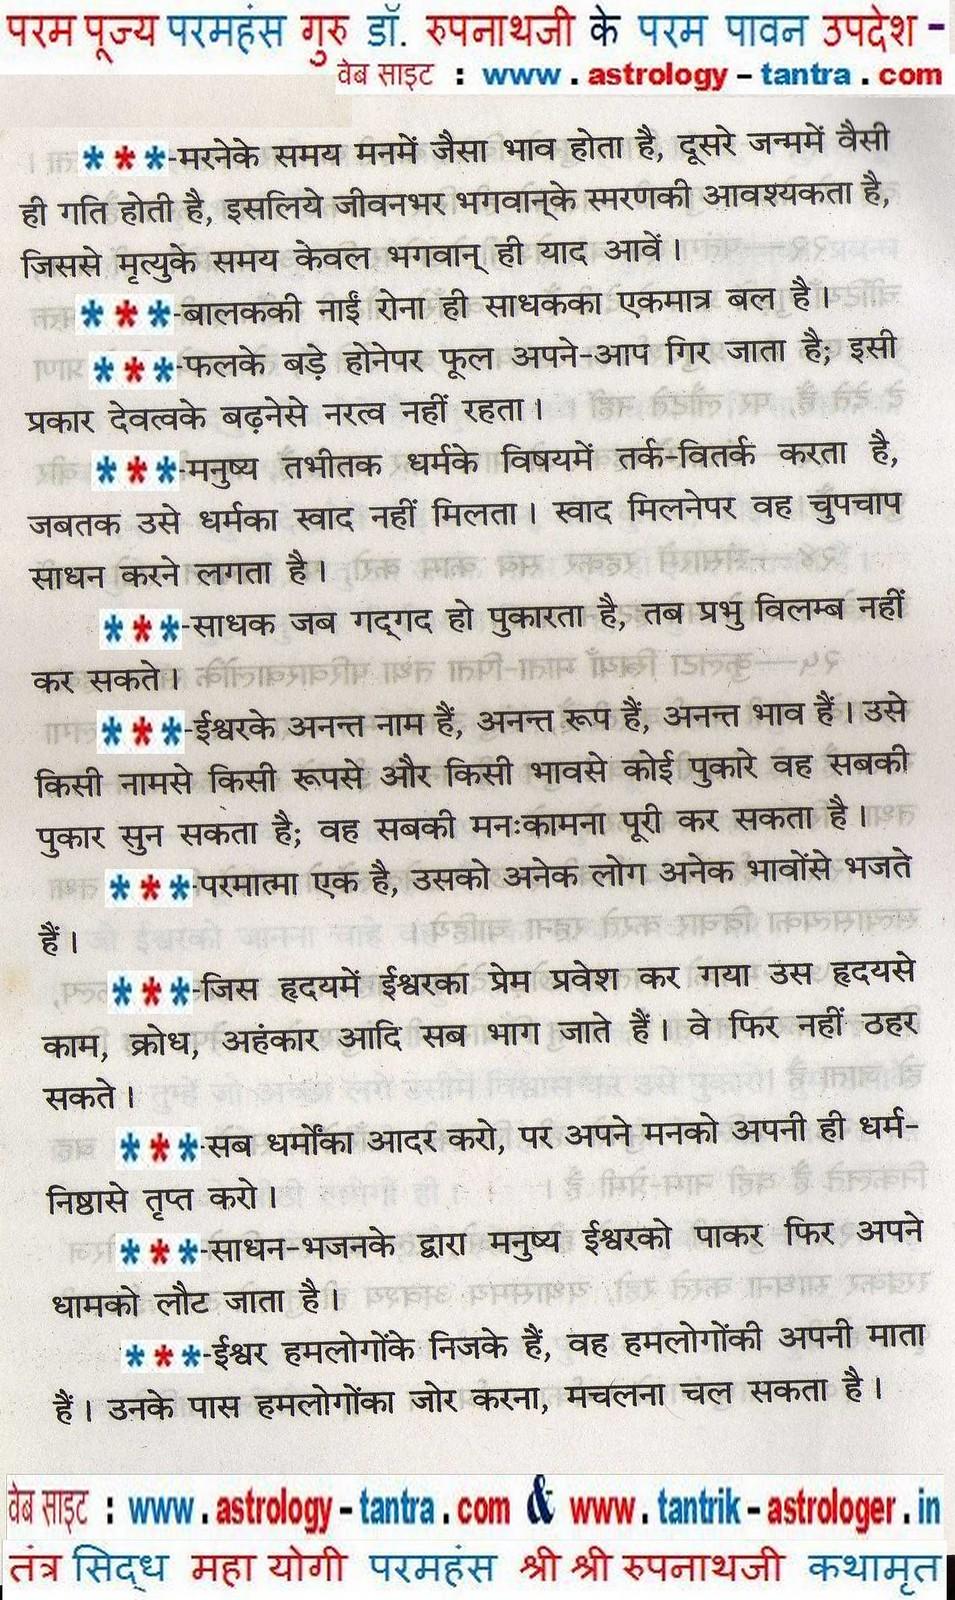 The Nectar of Tantra Siddha Maha Yogi Paramahamsa Dr